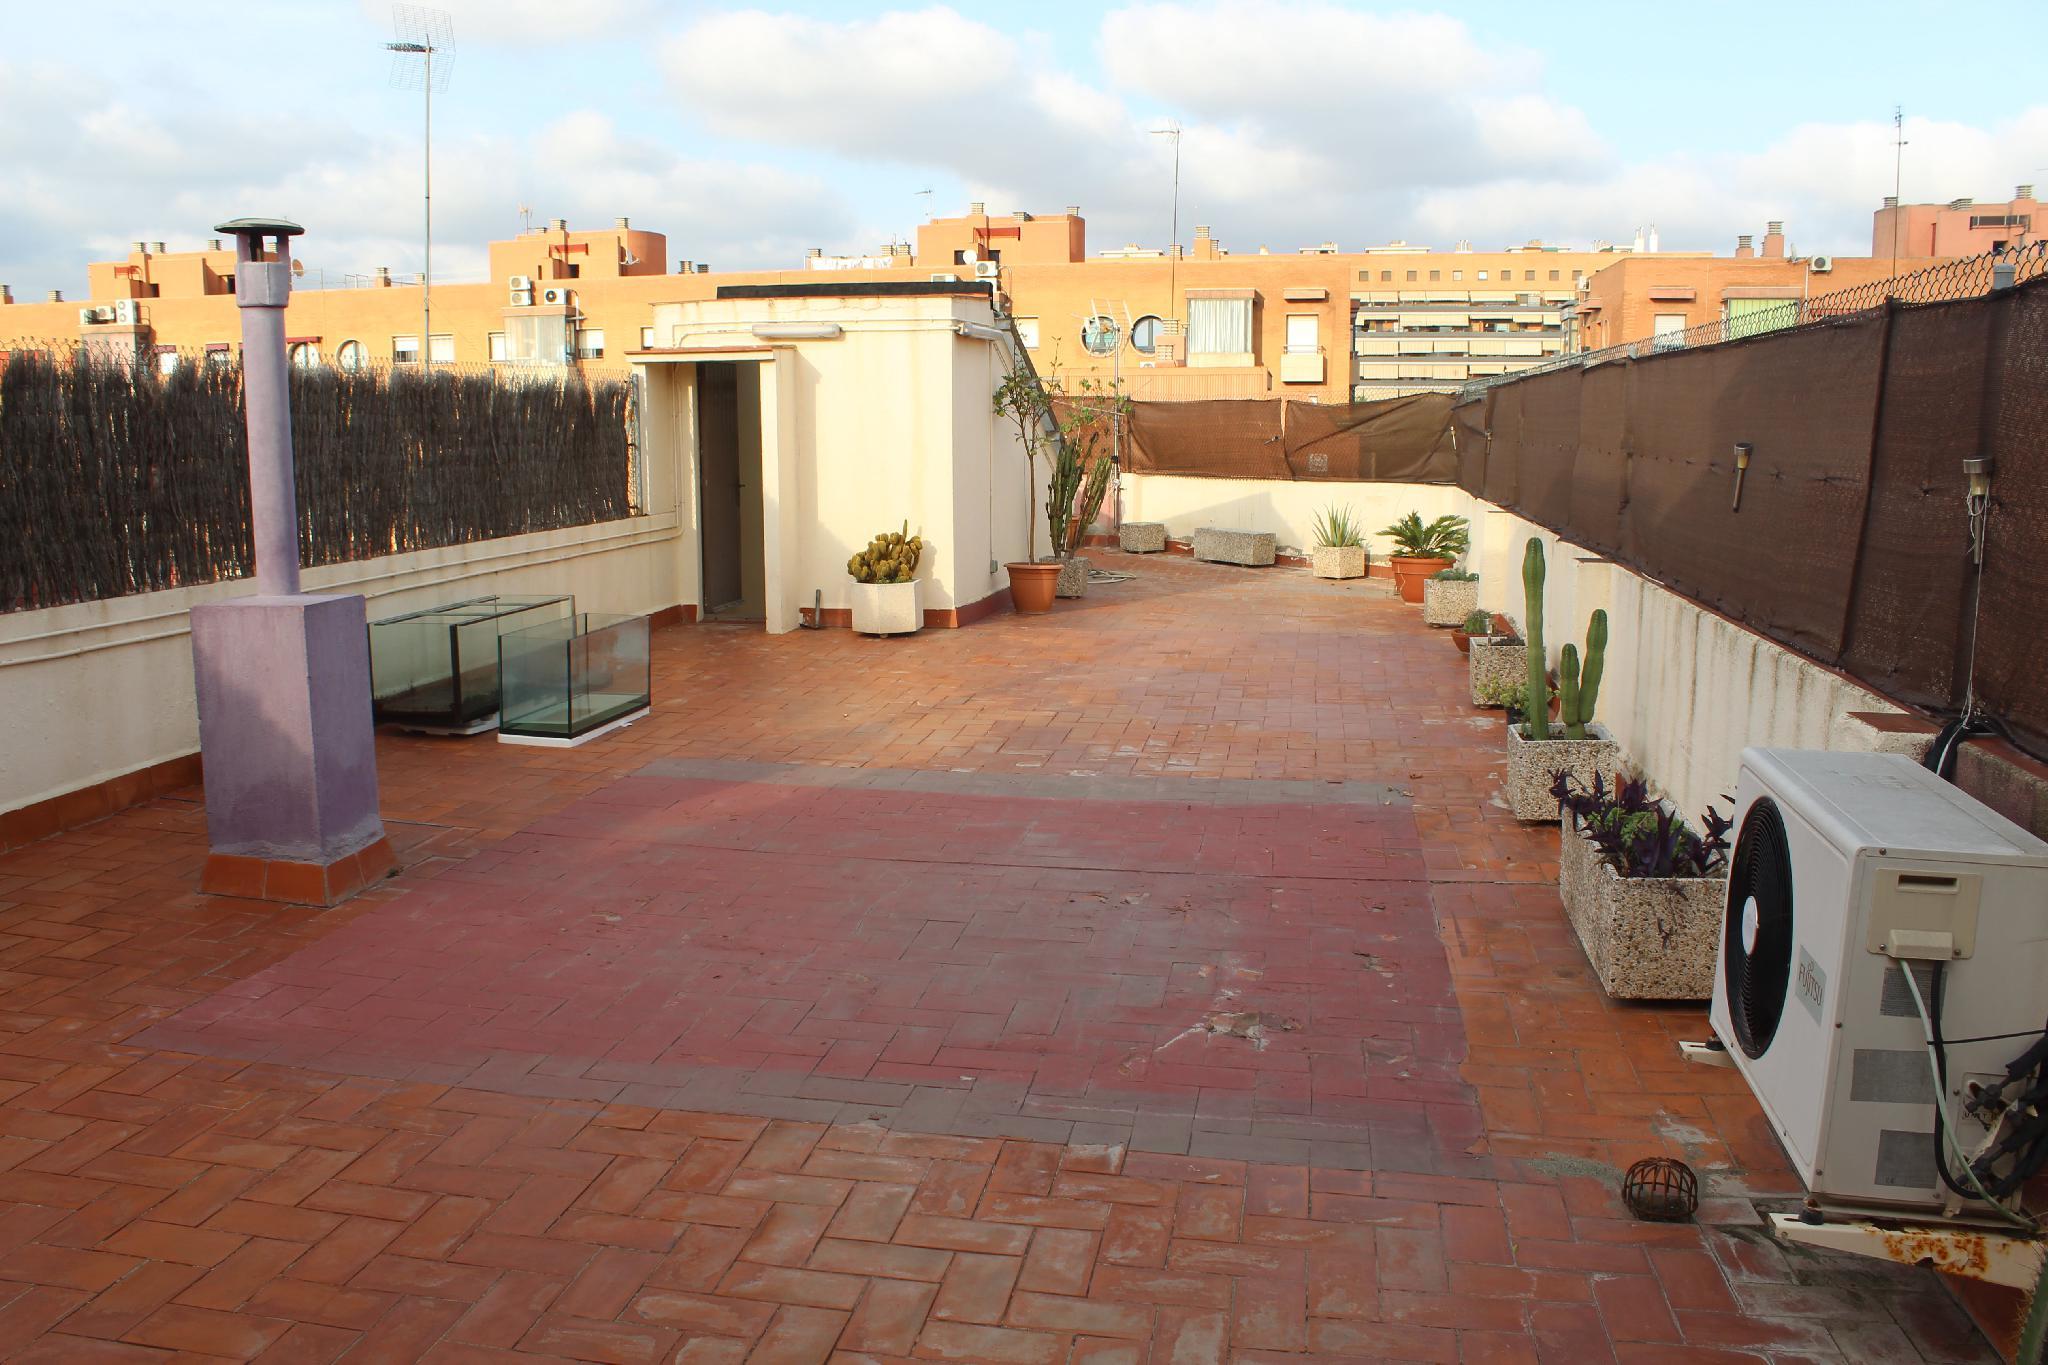 44209 - Almeda, calle Lepanto